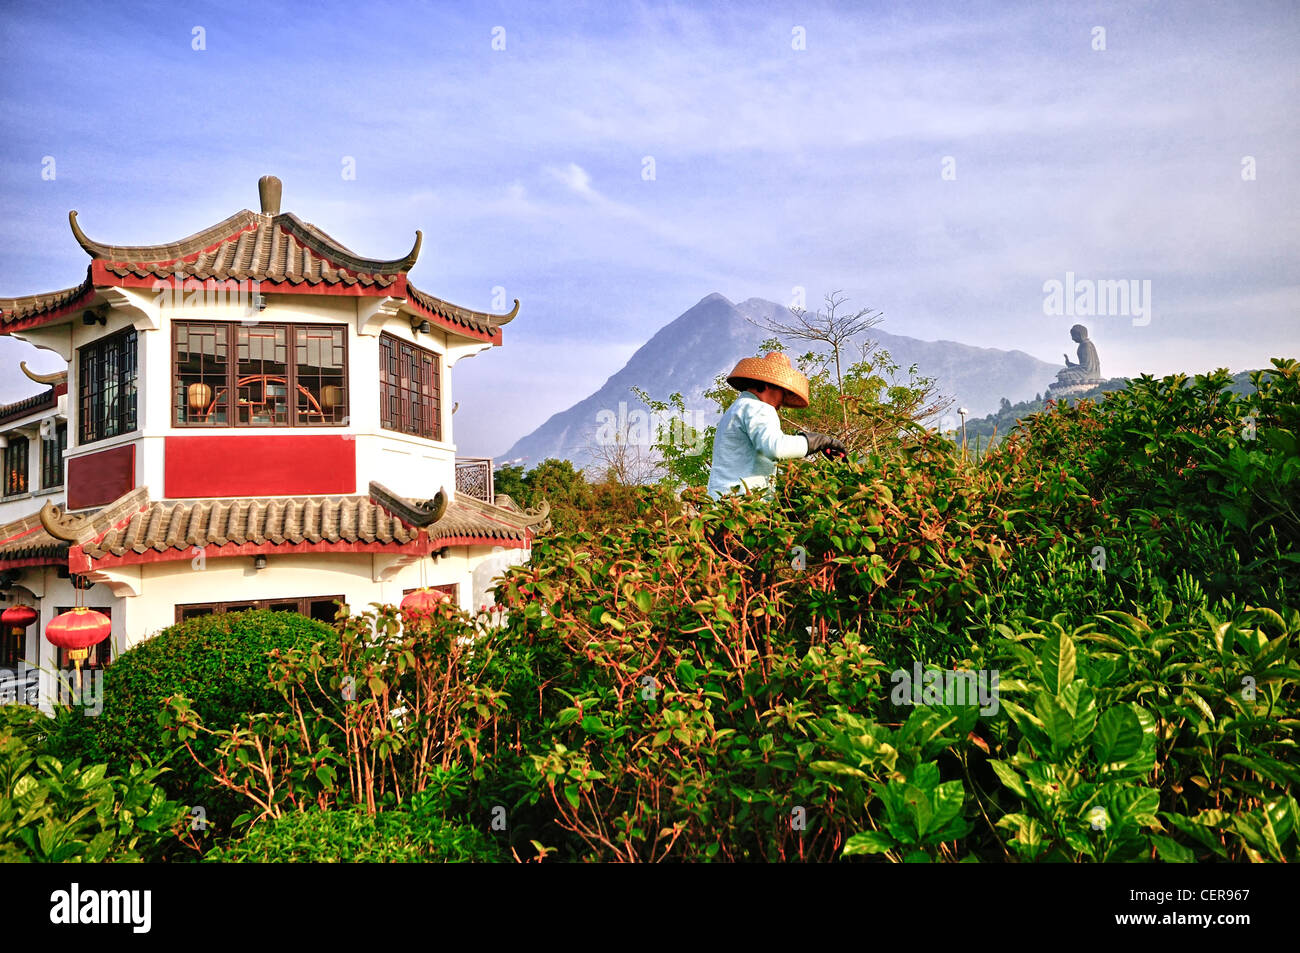 Worker Harvesting Tea overlooking the Lantau Peak and the Tian Tan Buddha - Stock Image